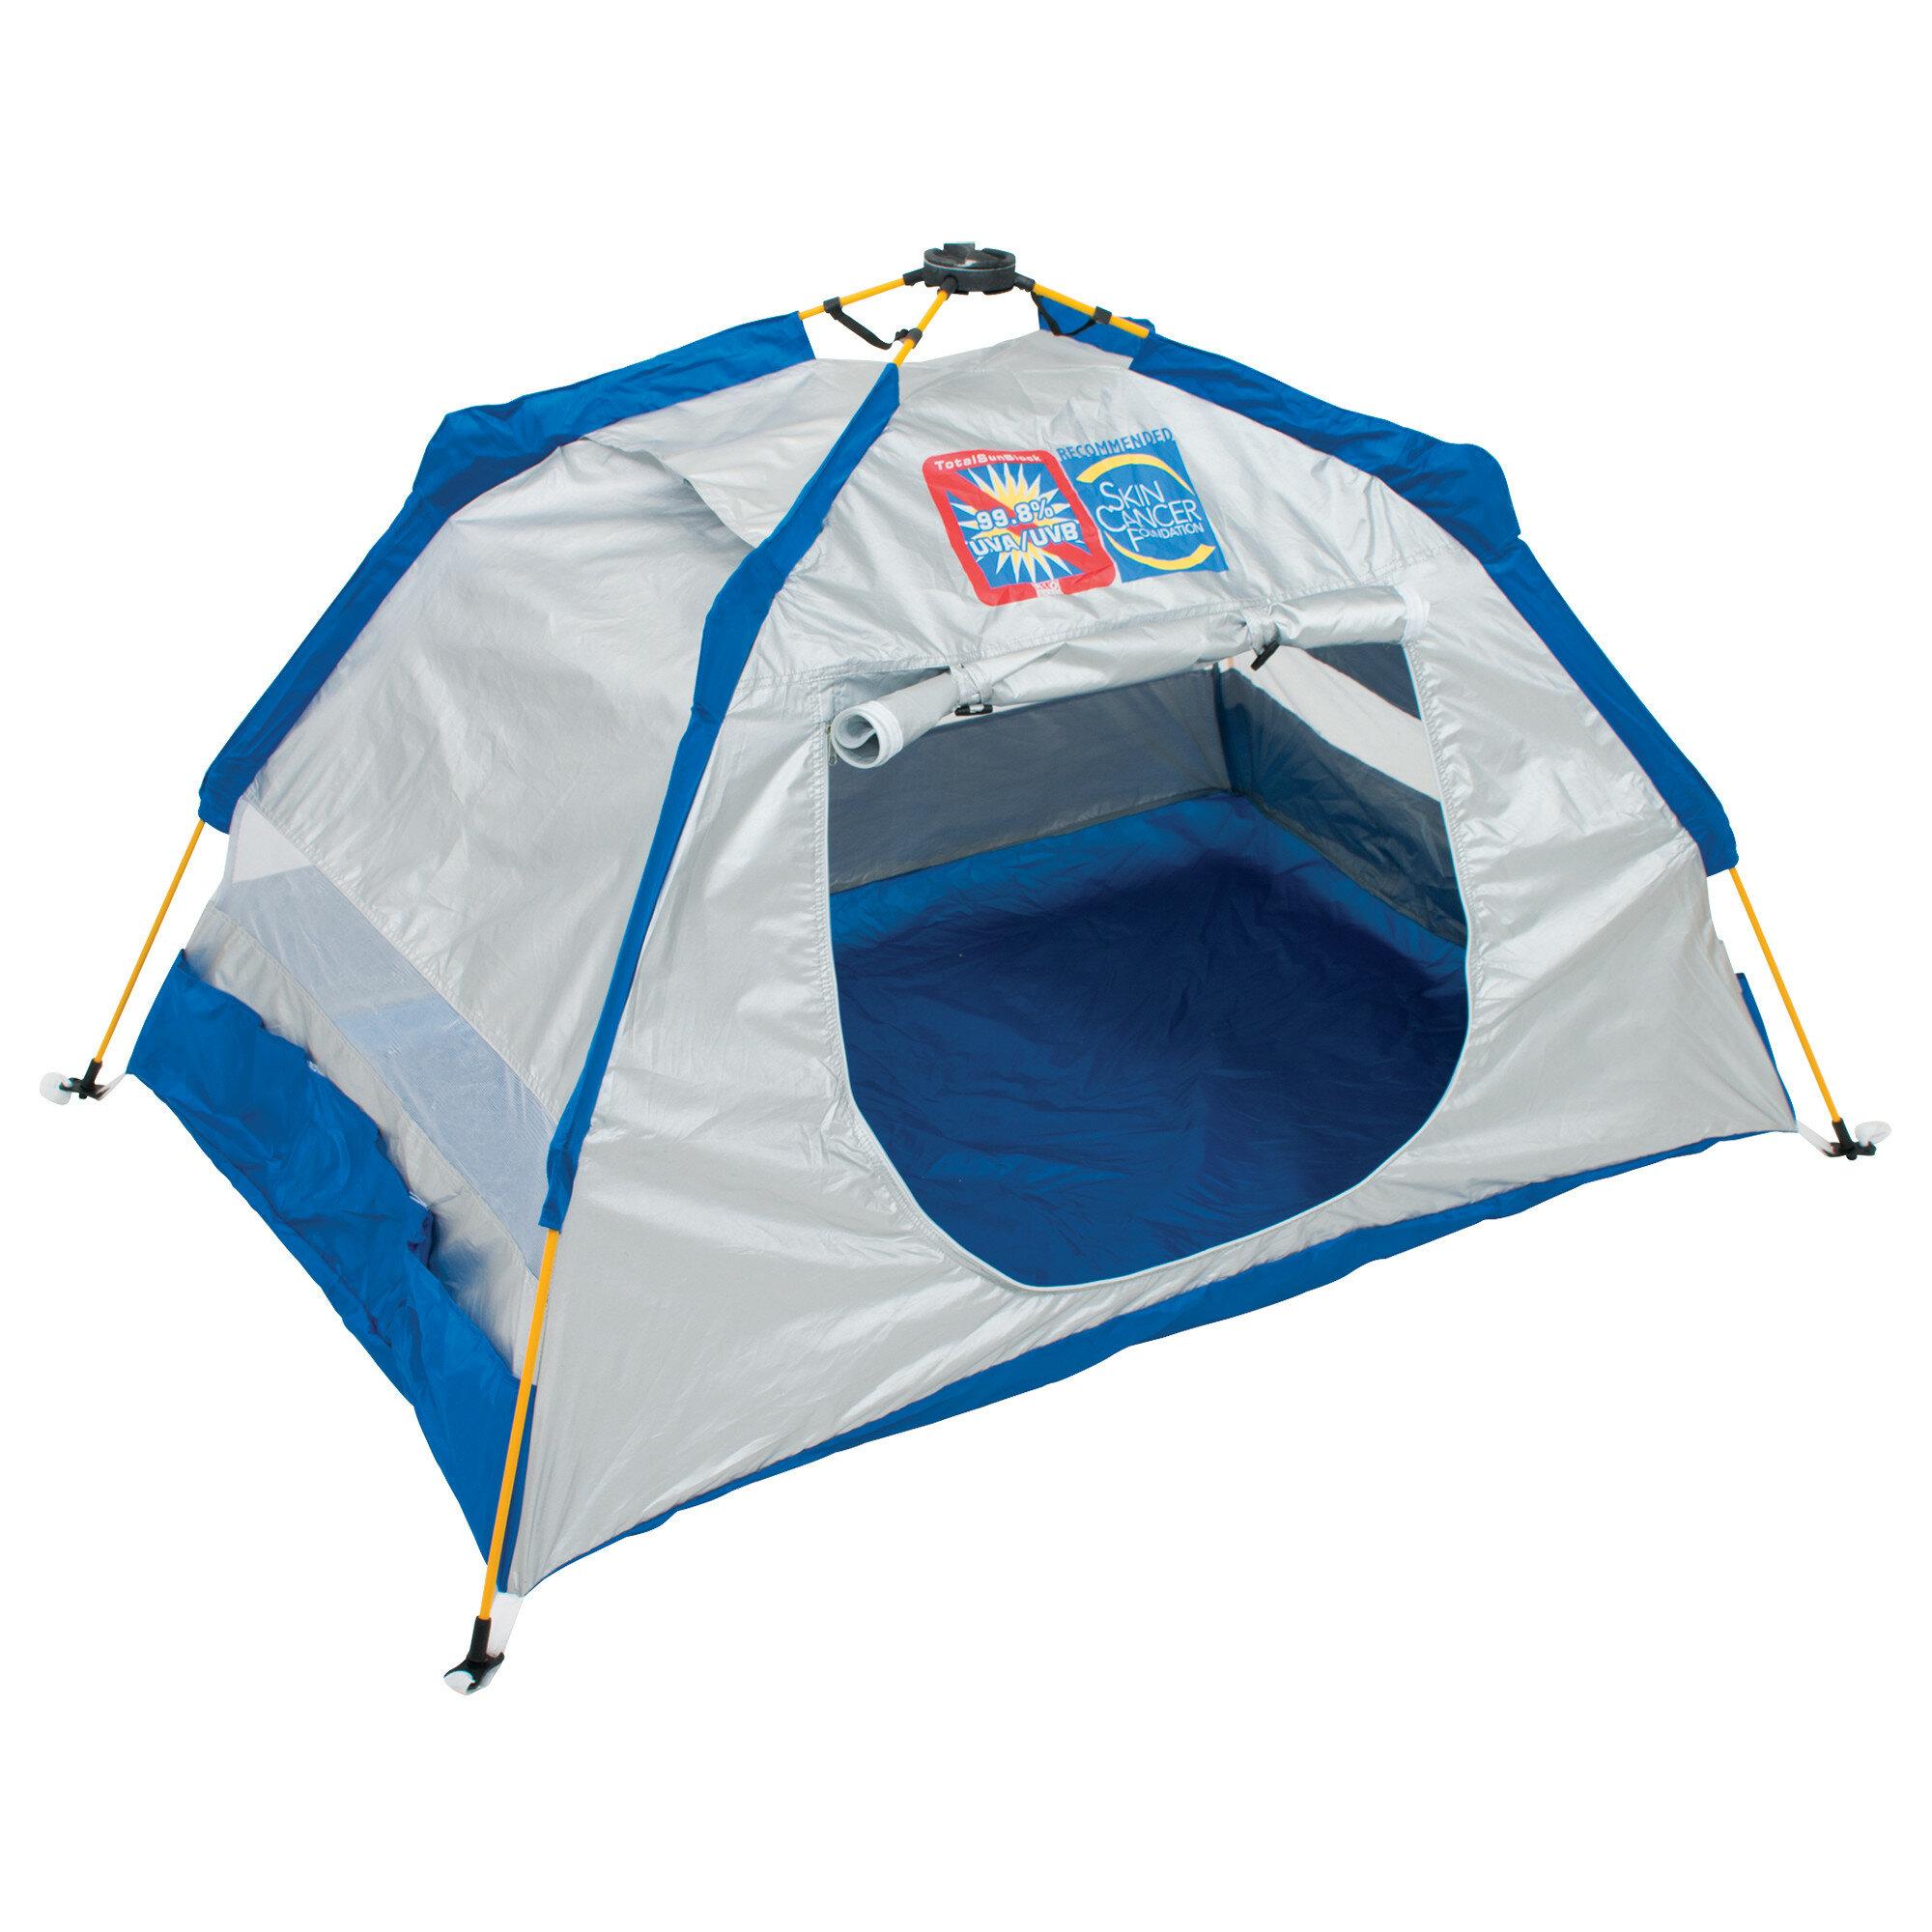 hot sale online 8429b ea56b Total Sun Block Kid?s Pop-Up Beach Tent